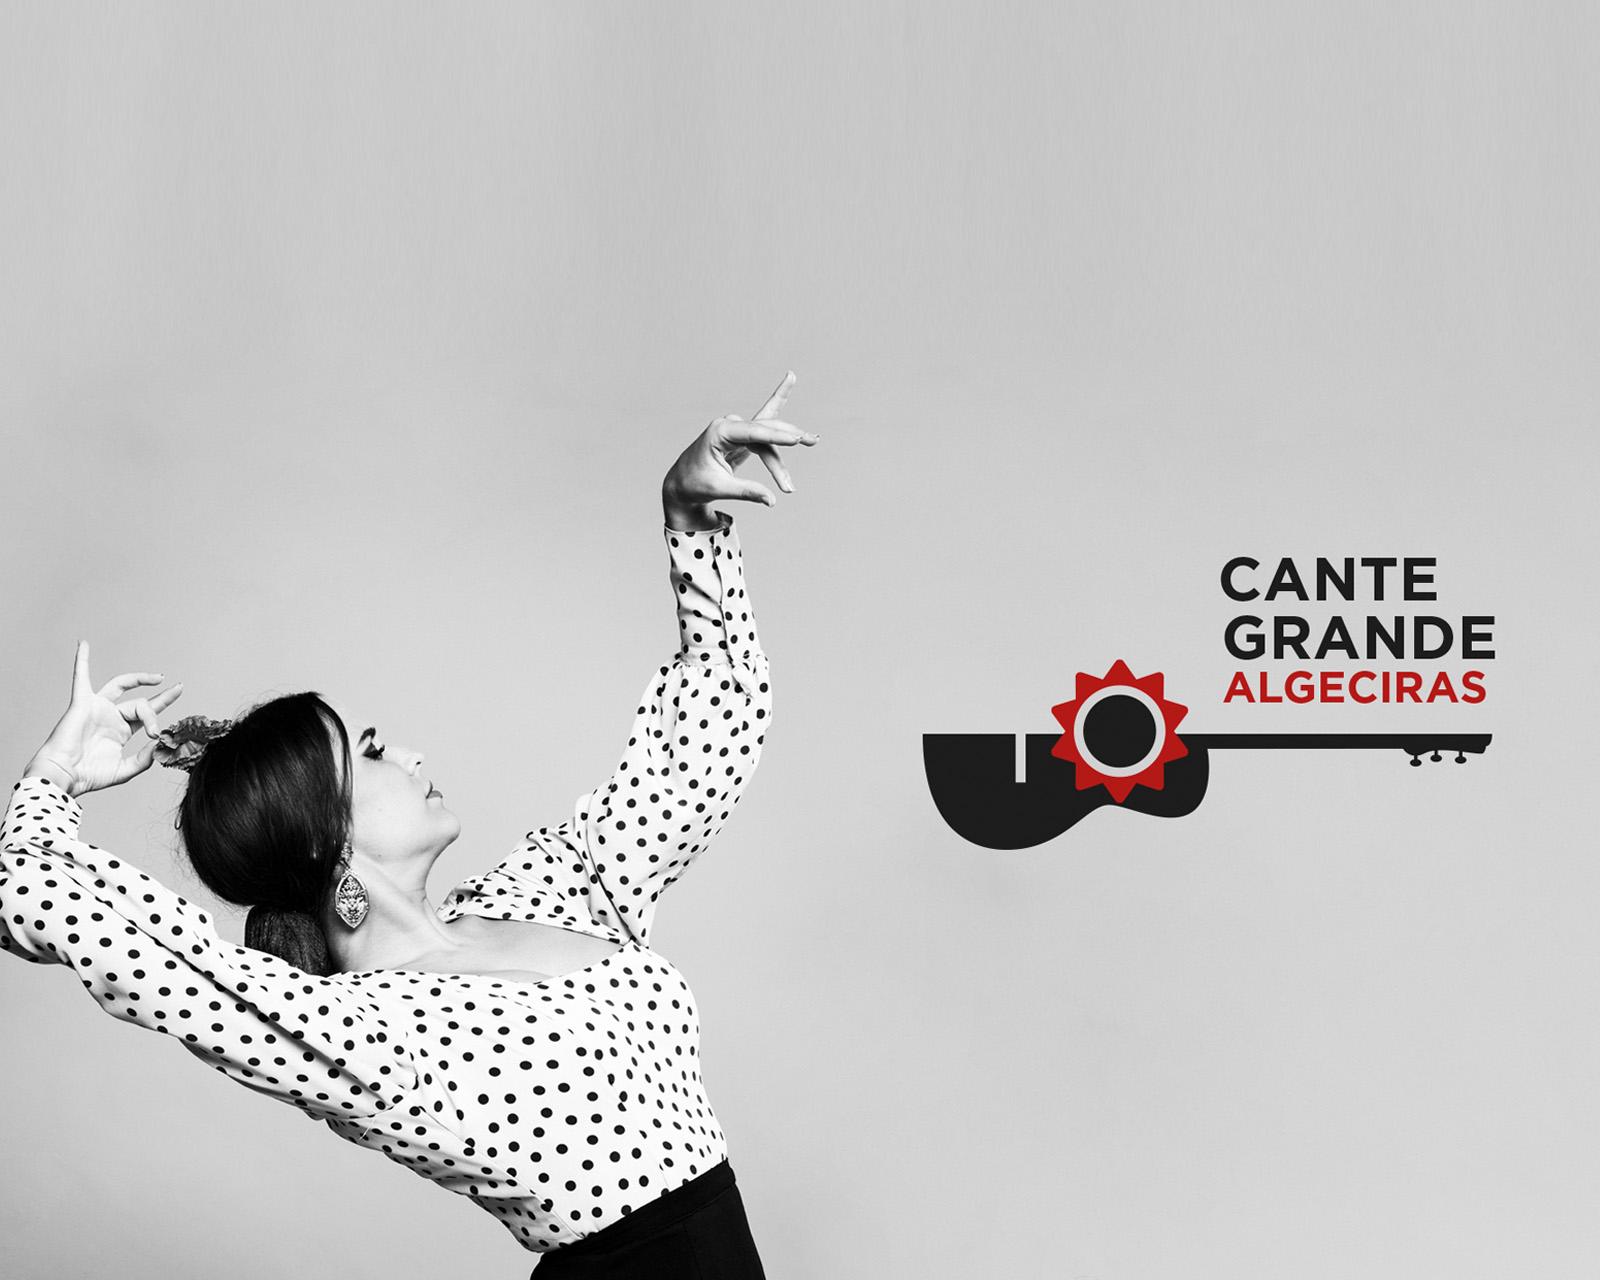 Logotipo cante grande flamenco